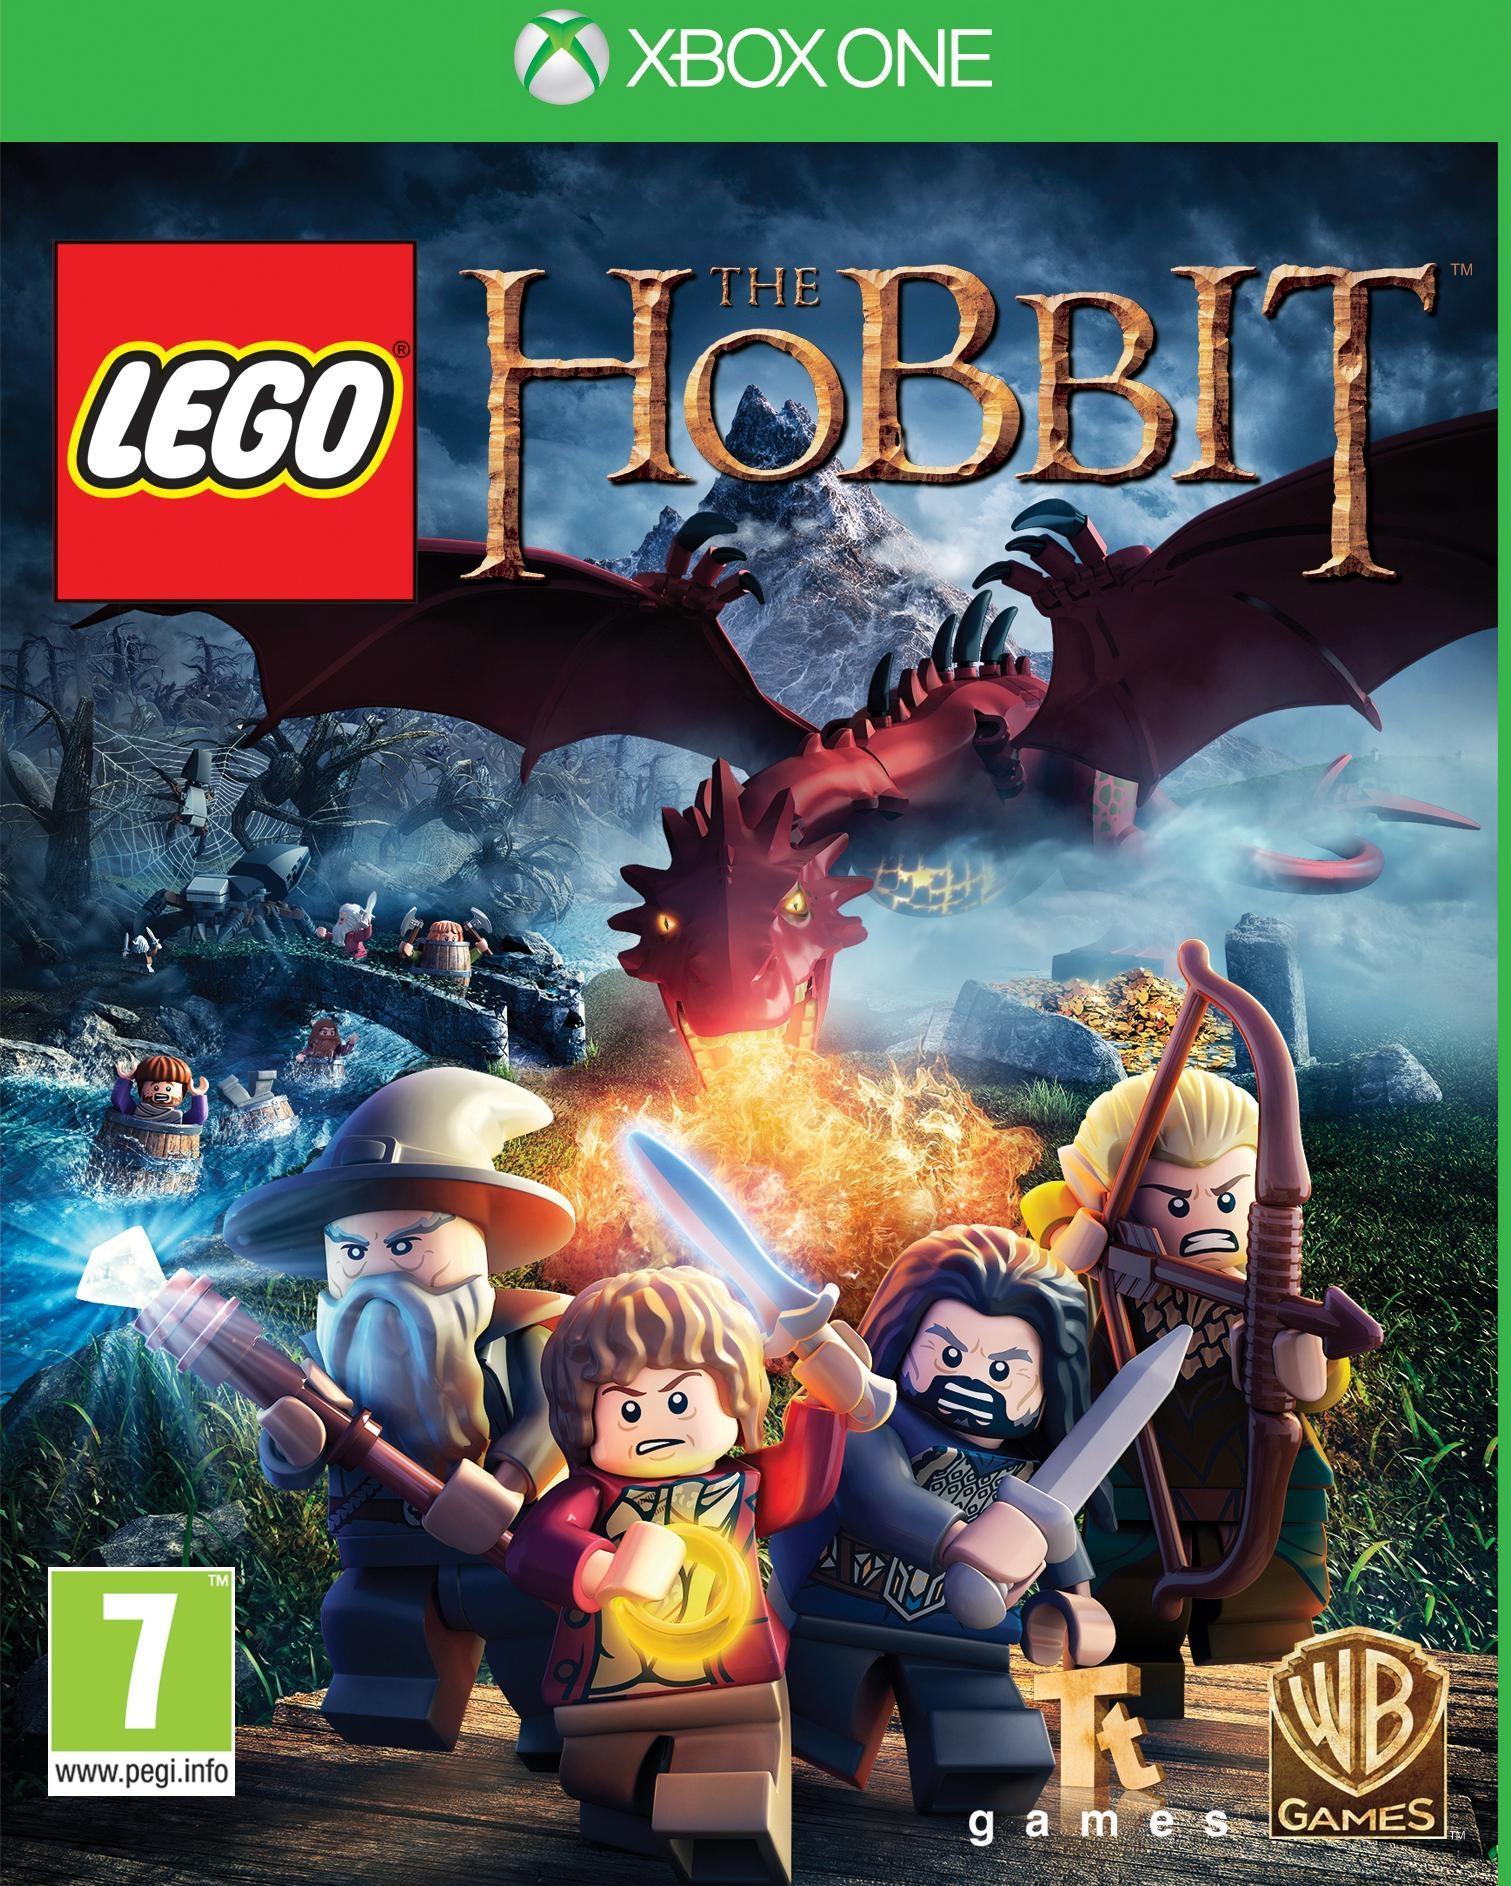 Mindscape LEGO Hobbit Xbox One (1000452205) thumbnail